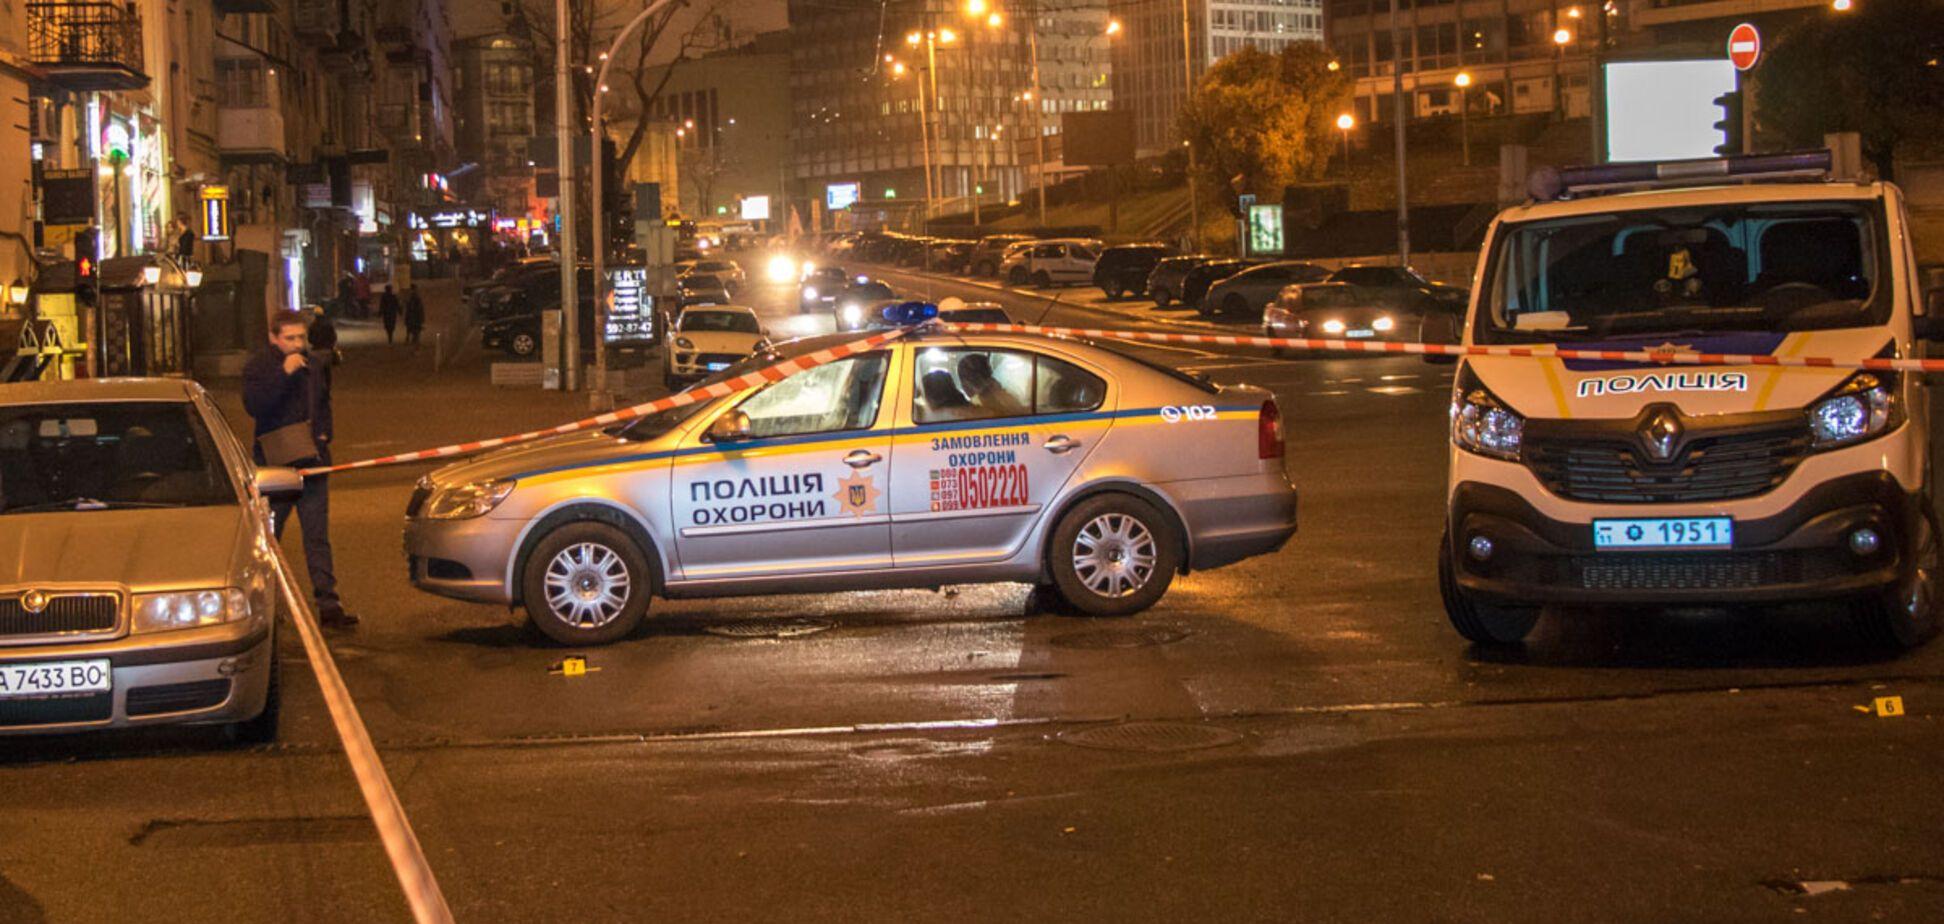 Киев, покушение, прокуратура